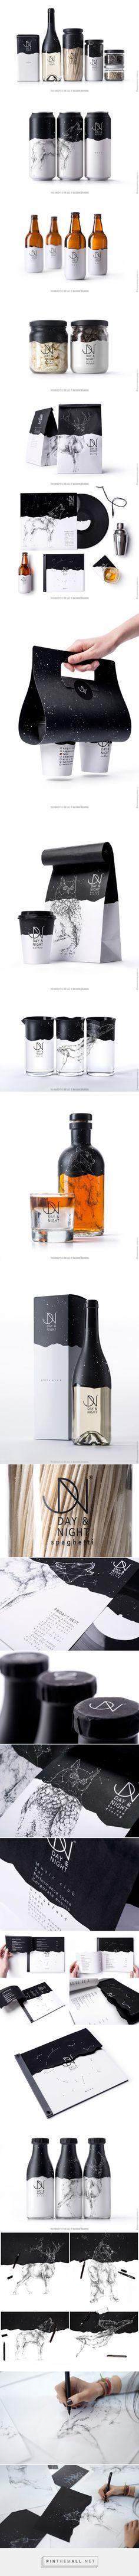 Day & Night packaging designed by Backbone Branding (Armenia) - http://www.packagingoftheworld.com/2016/03/day-night.html